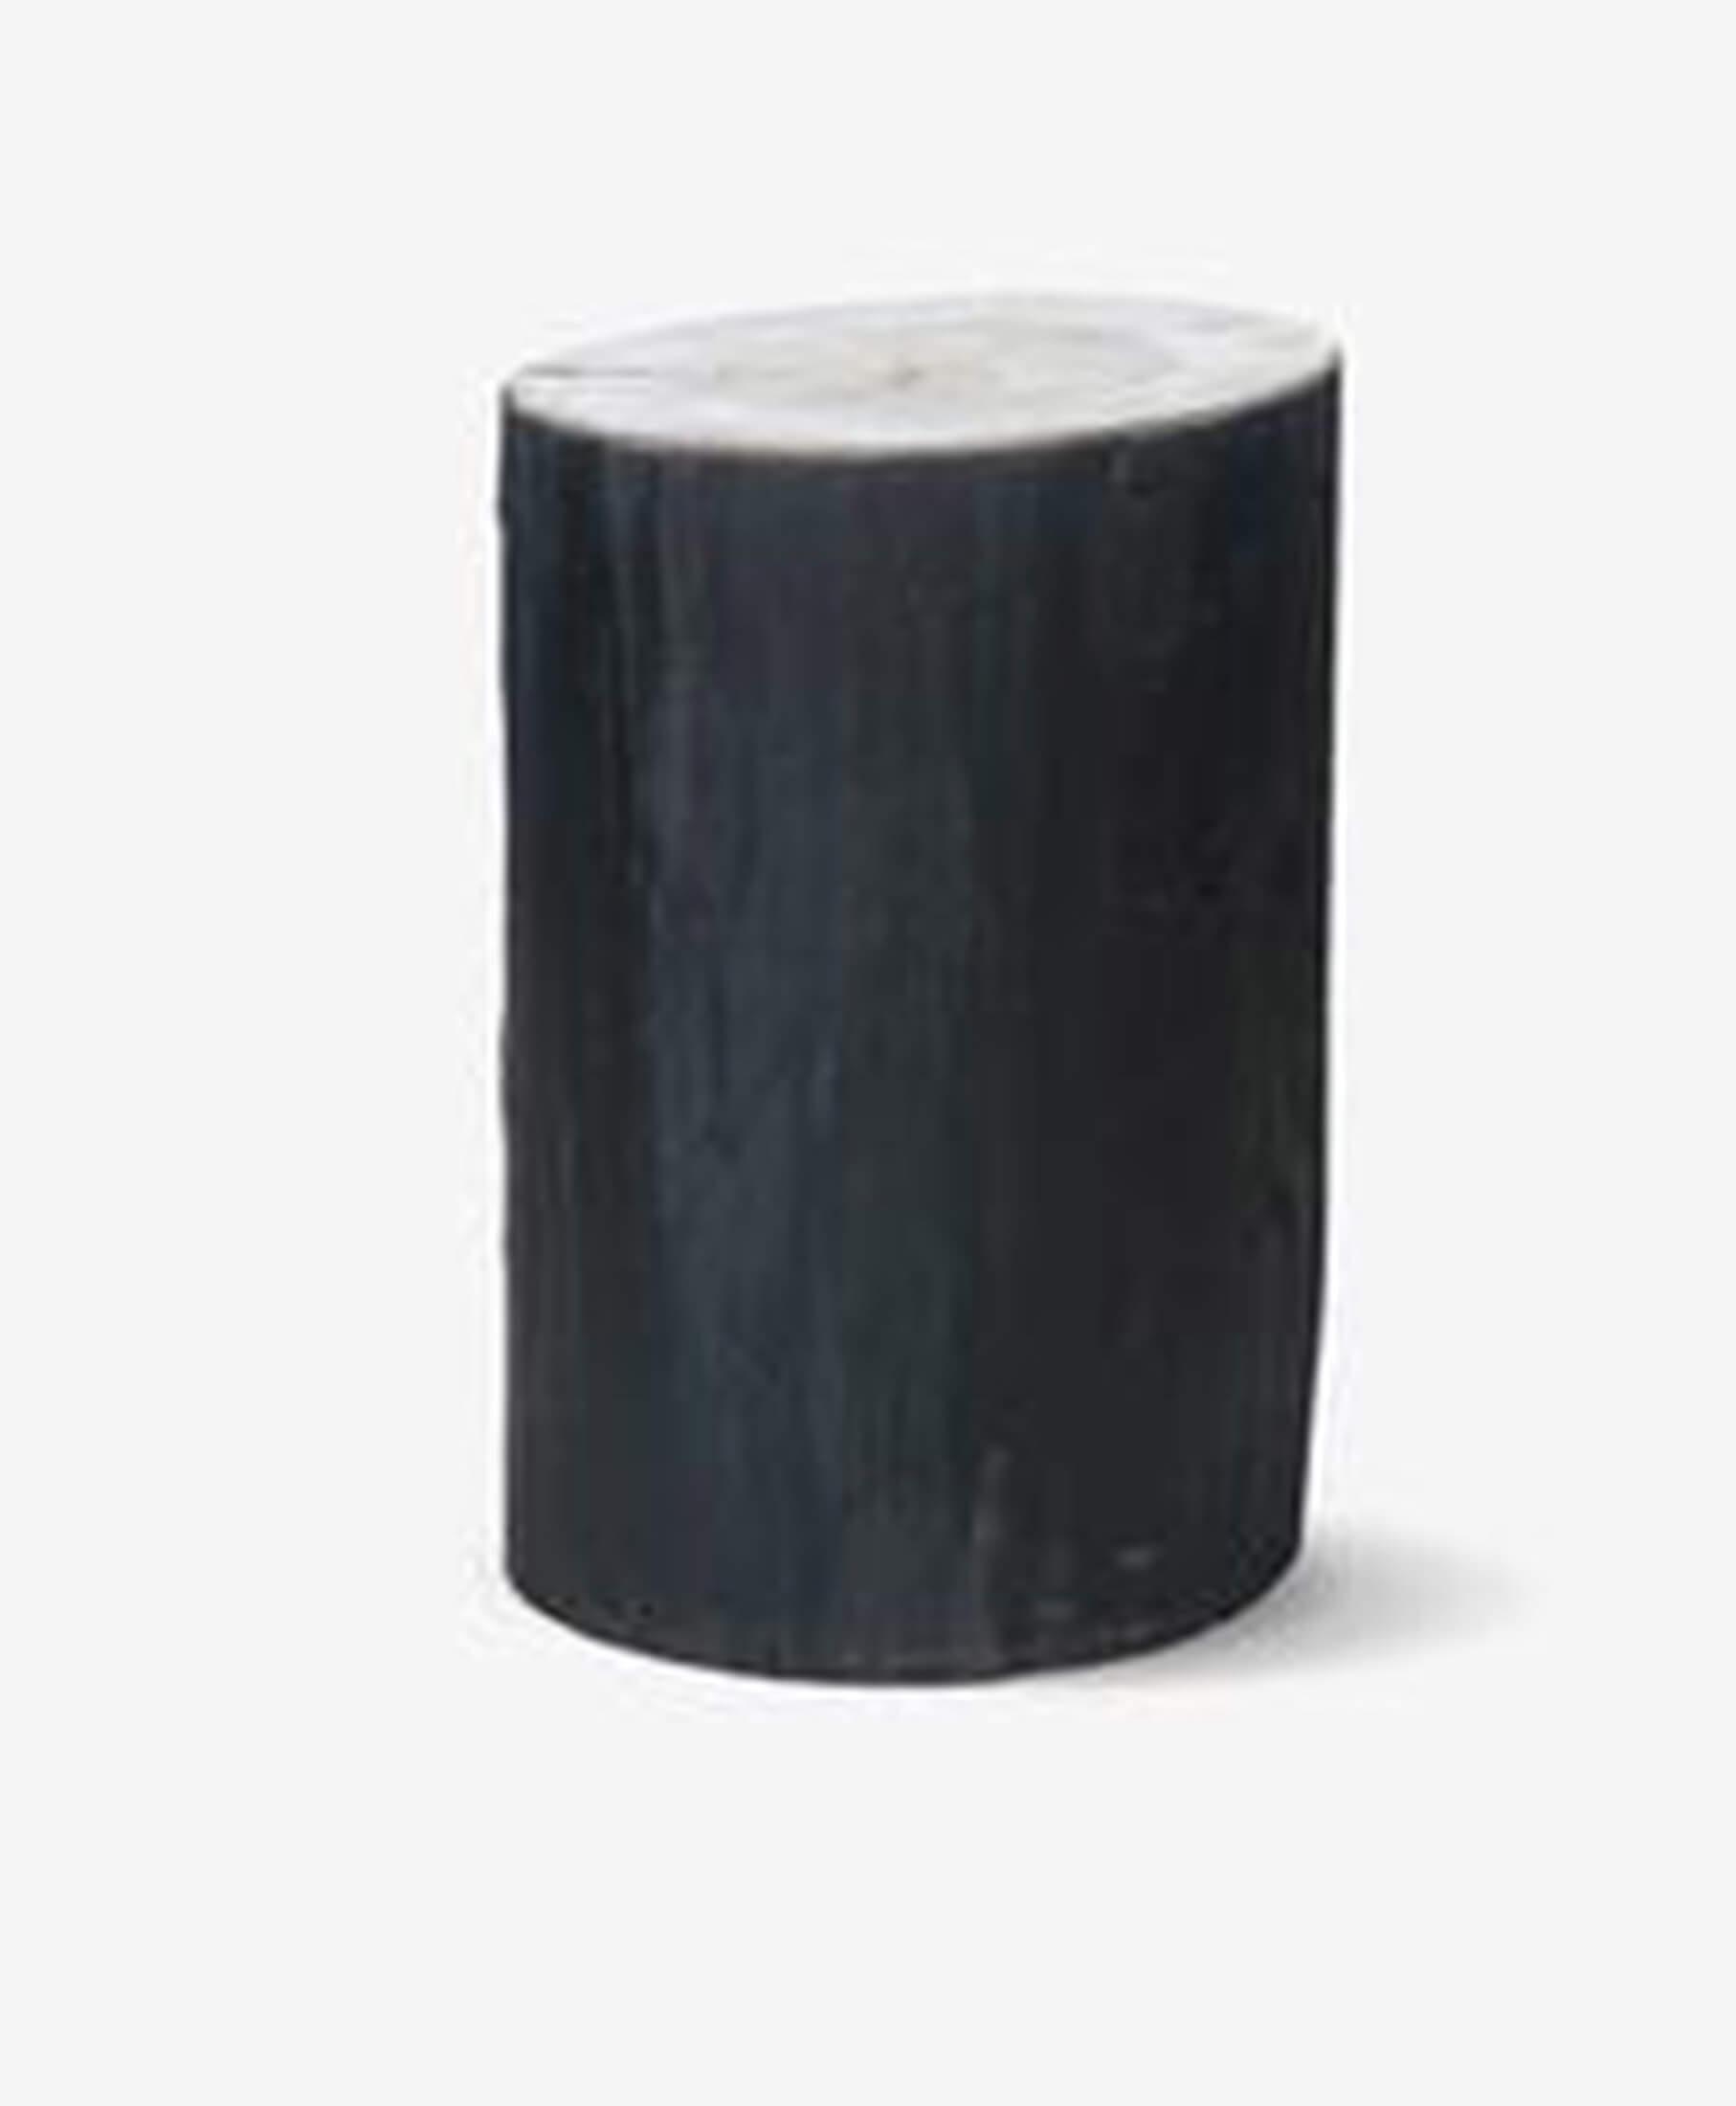 est living grey edit tonk stool mcm house